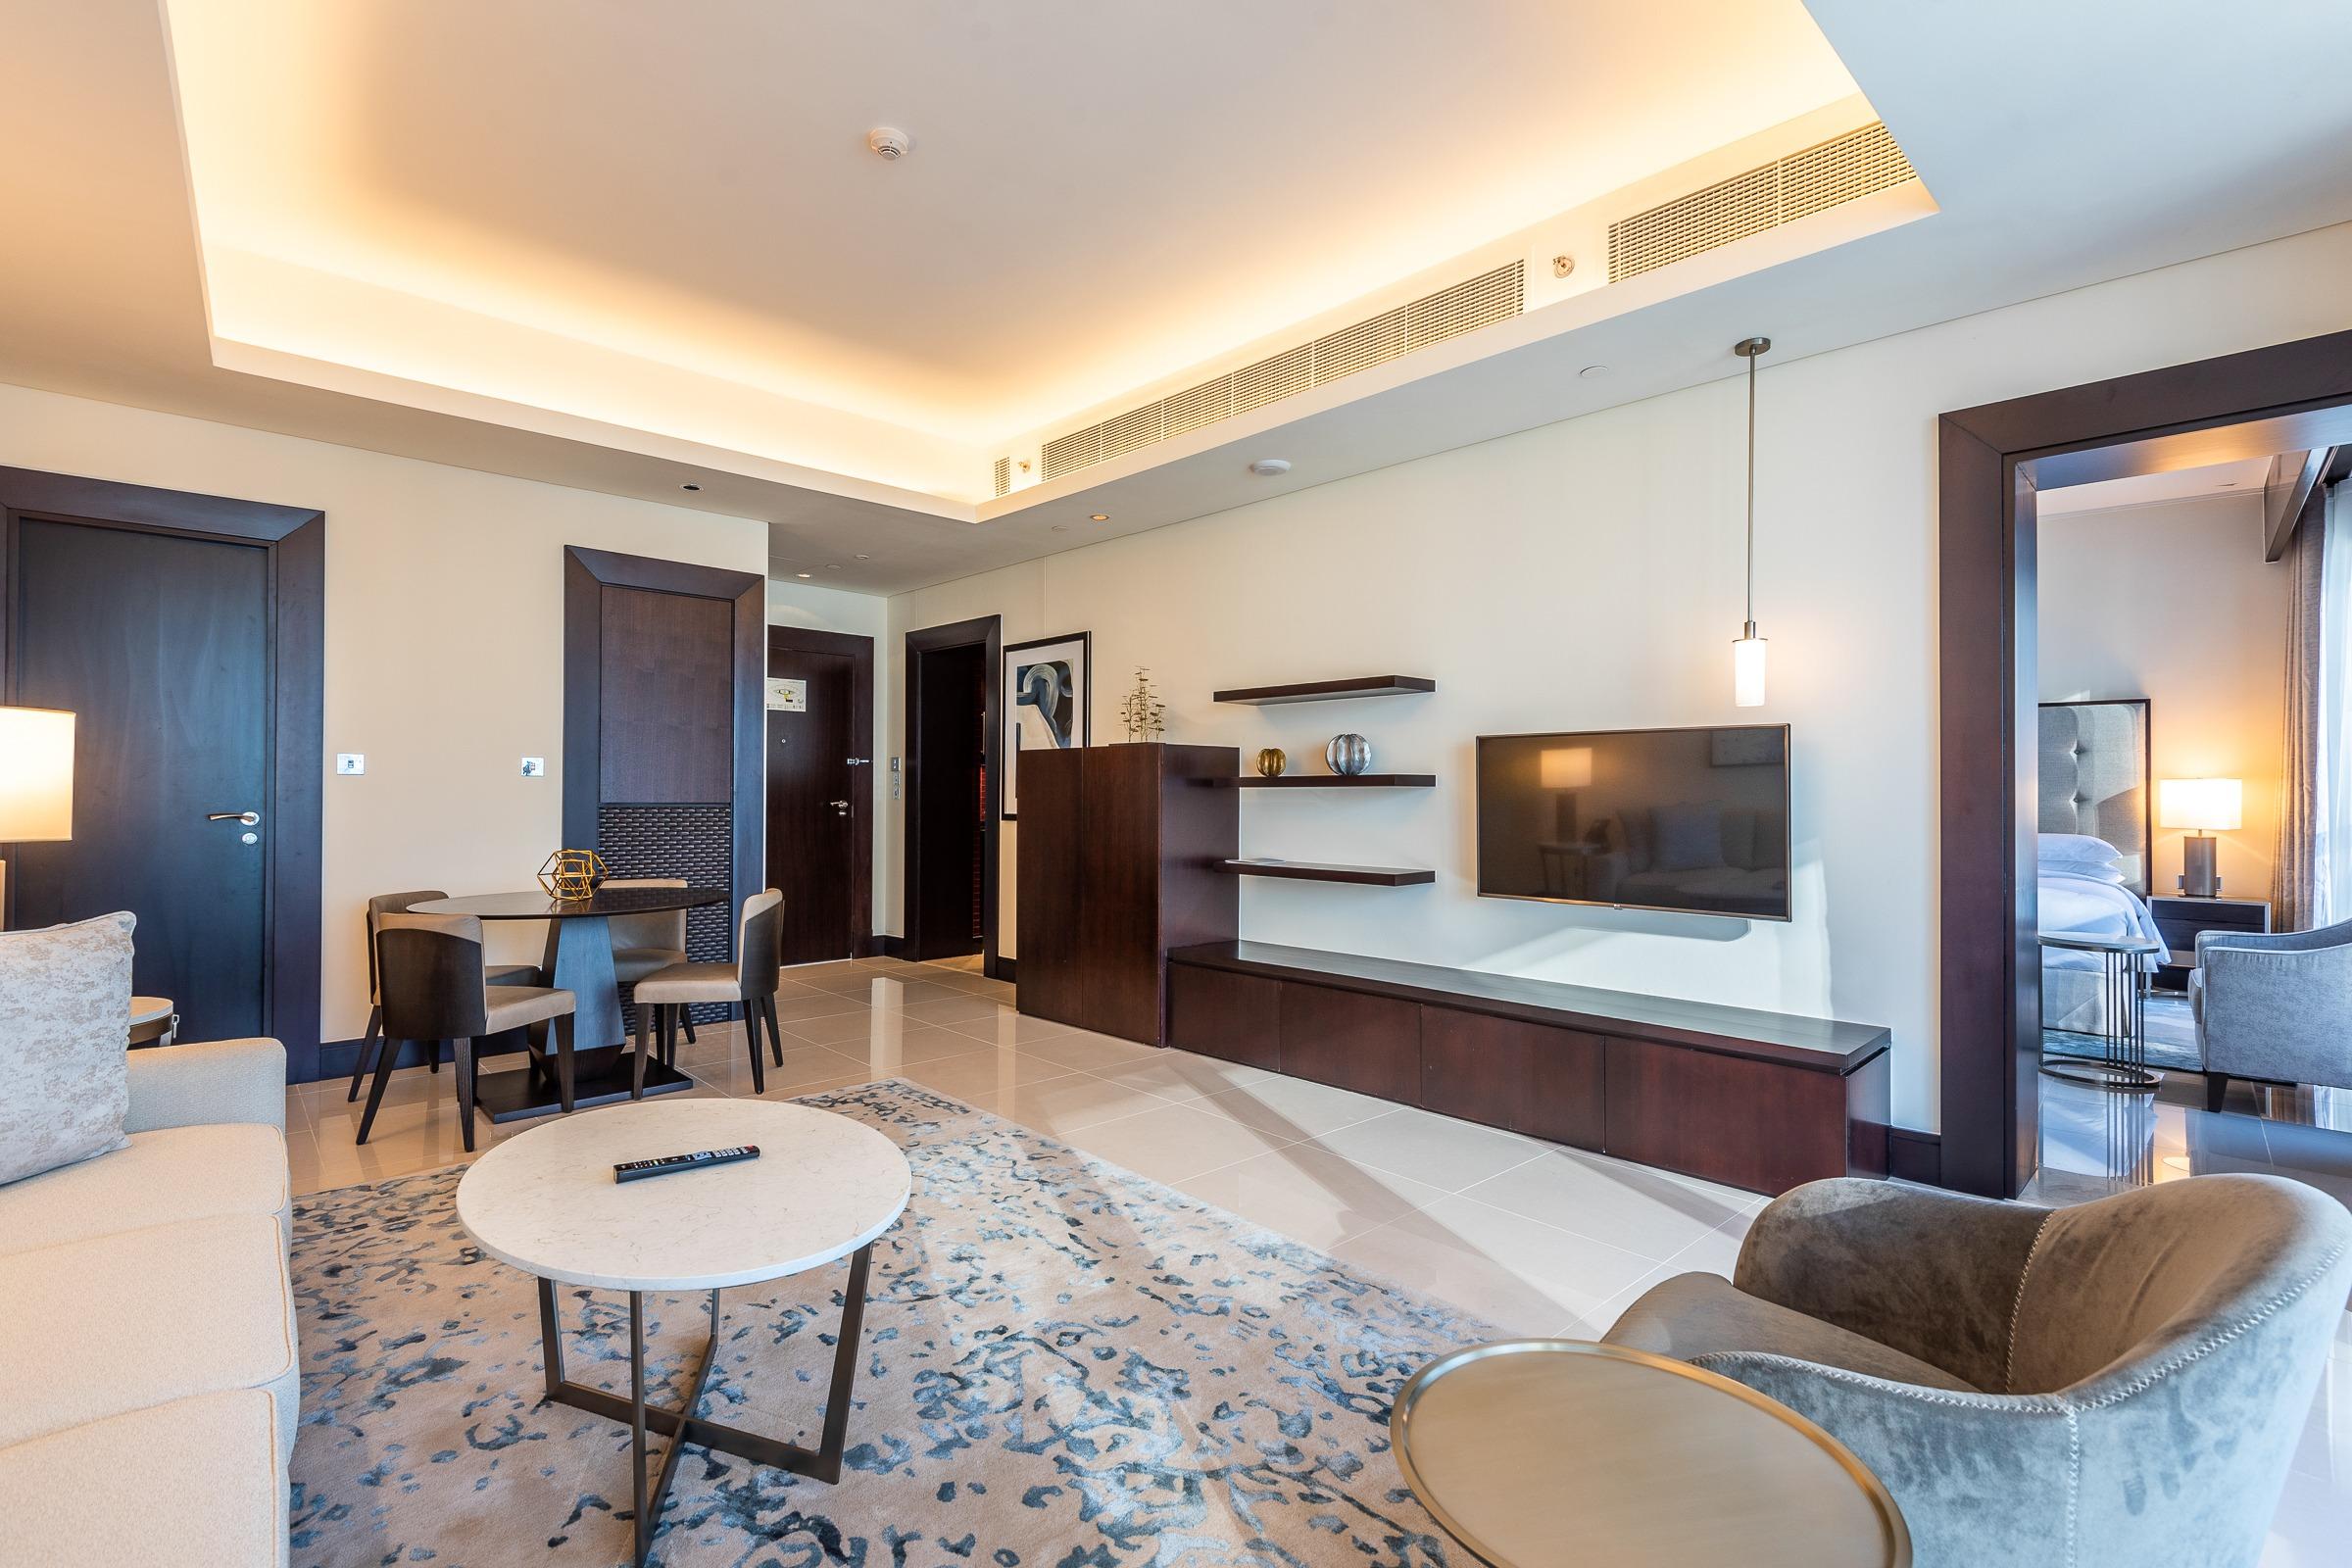 High Floor Luxury Hotel Apartment 1 Bed